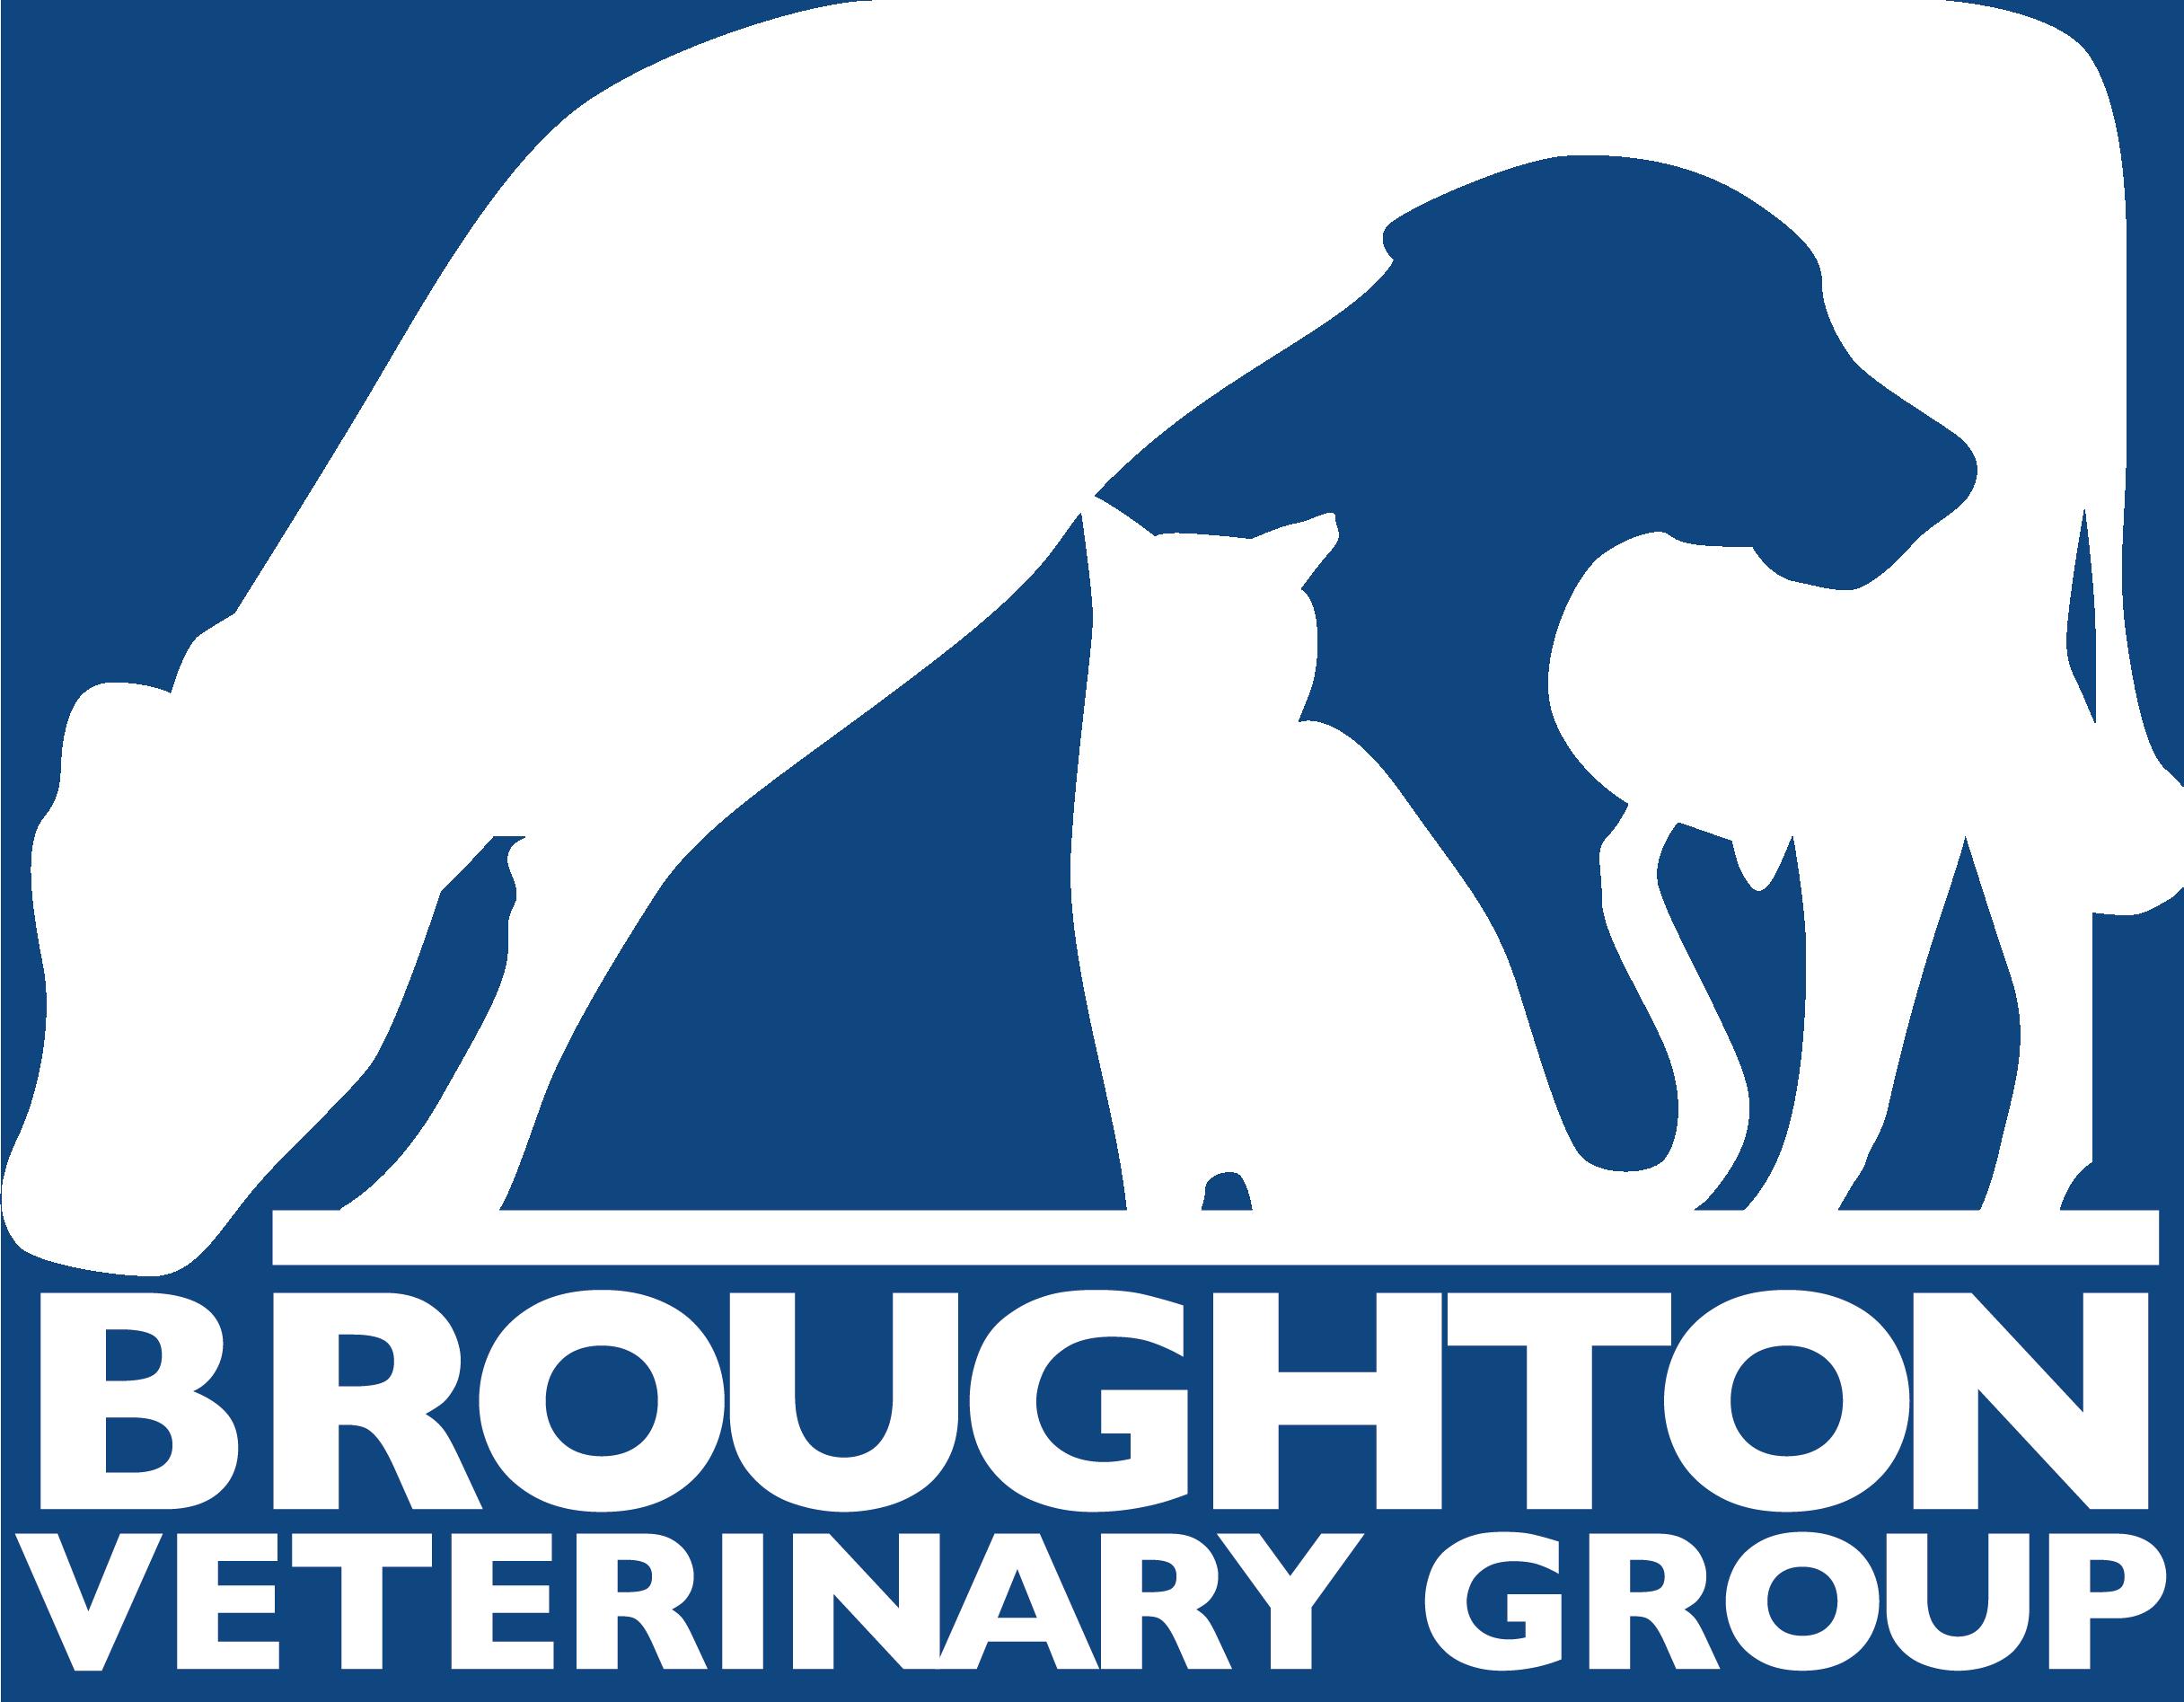 Broughton Veterinary Group, Lutterworth Lutterworth 01455 552117